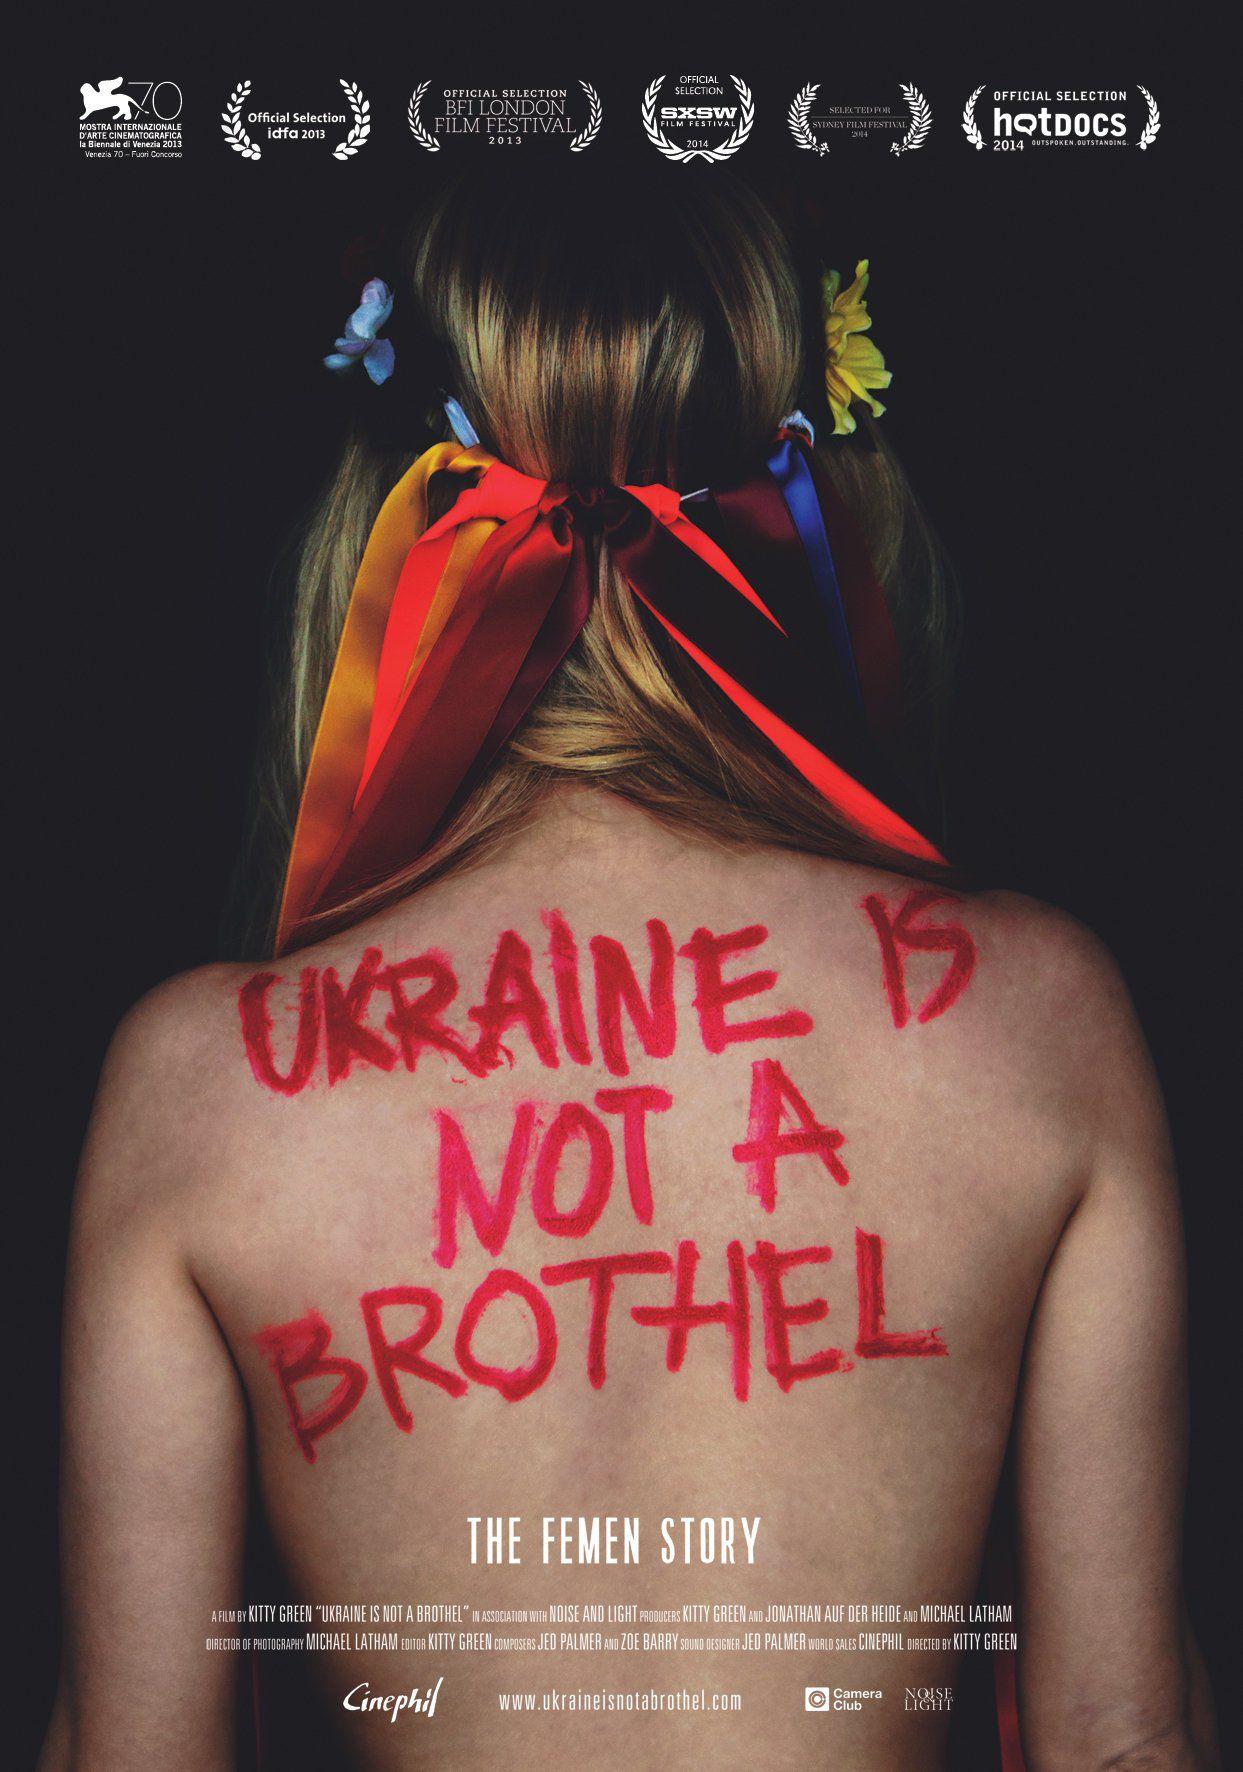 Ukraine Is Not a Brothel - Documentaire (2013)